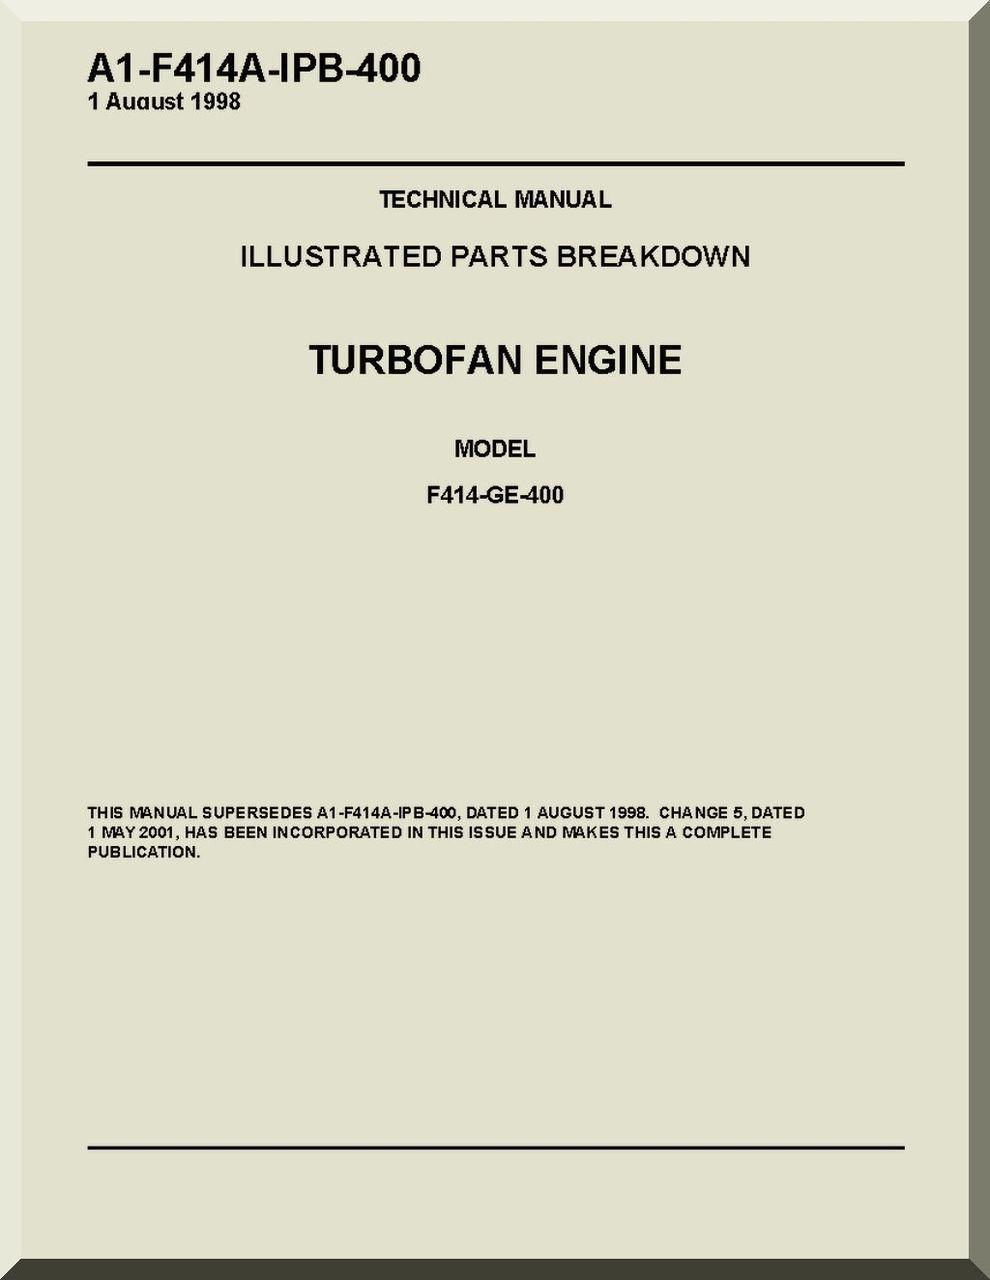 general electric f414 ge 400 aircraft turbofan engine. Black Bedroom Furniture Sets. Home Design Ideas